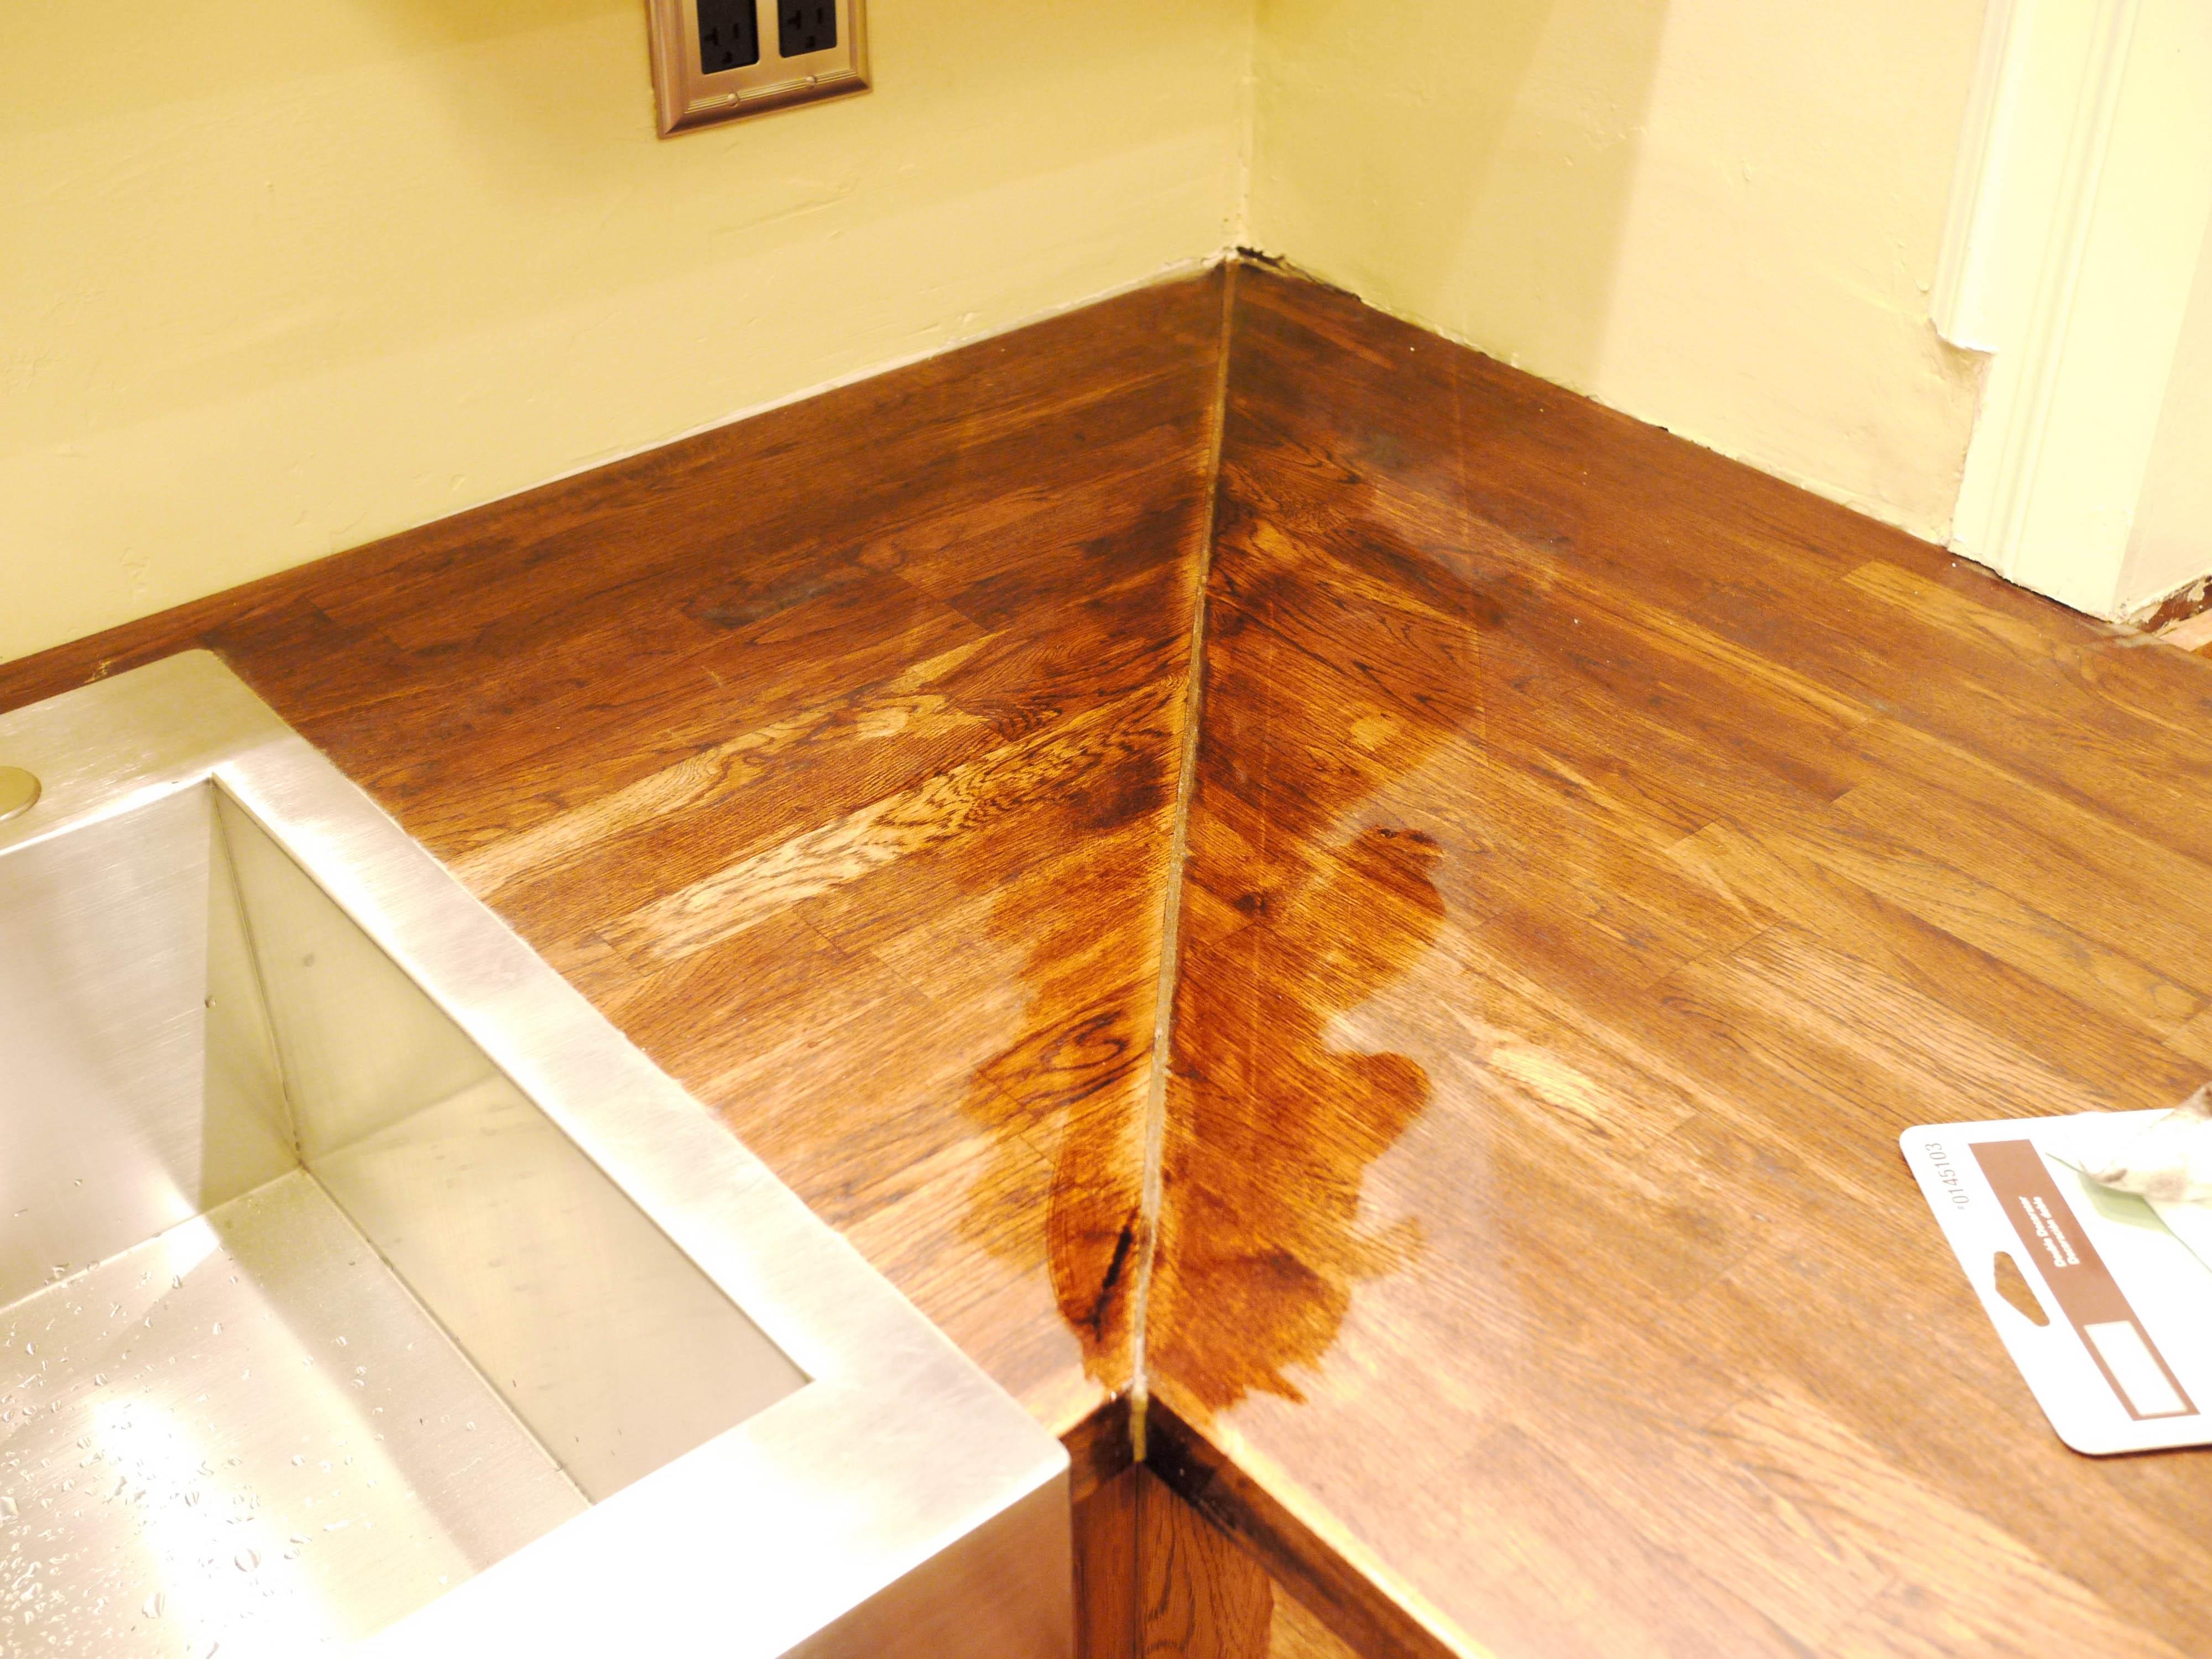 Wood House Decorating Ideas Diy Cnc Plans Download Balsa